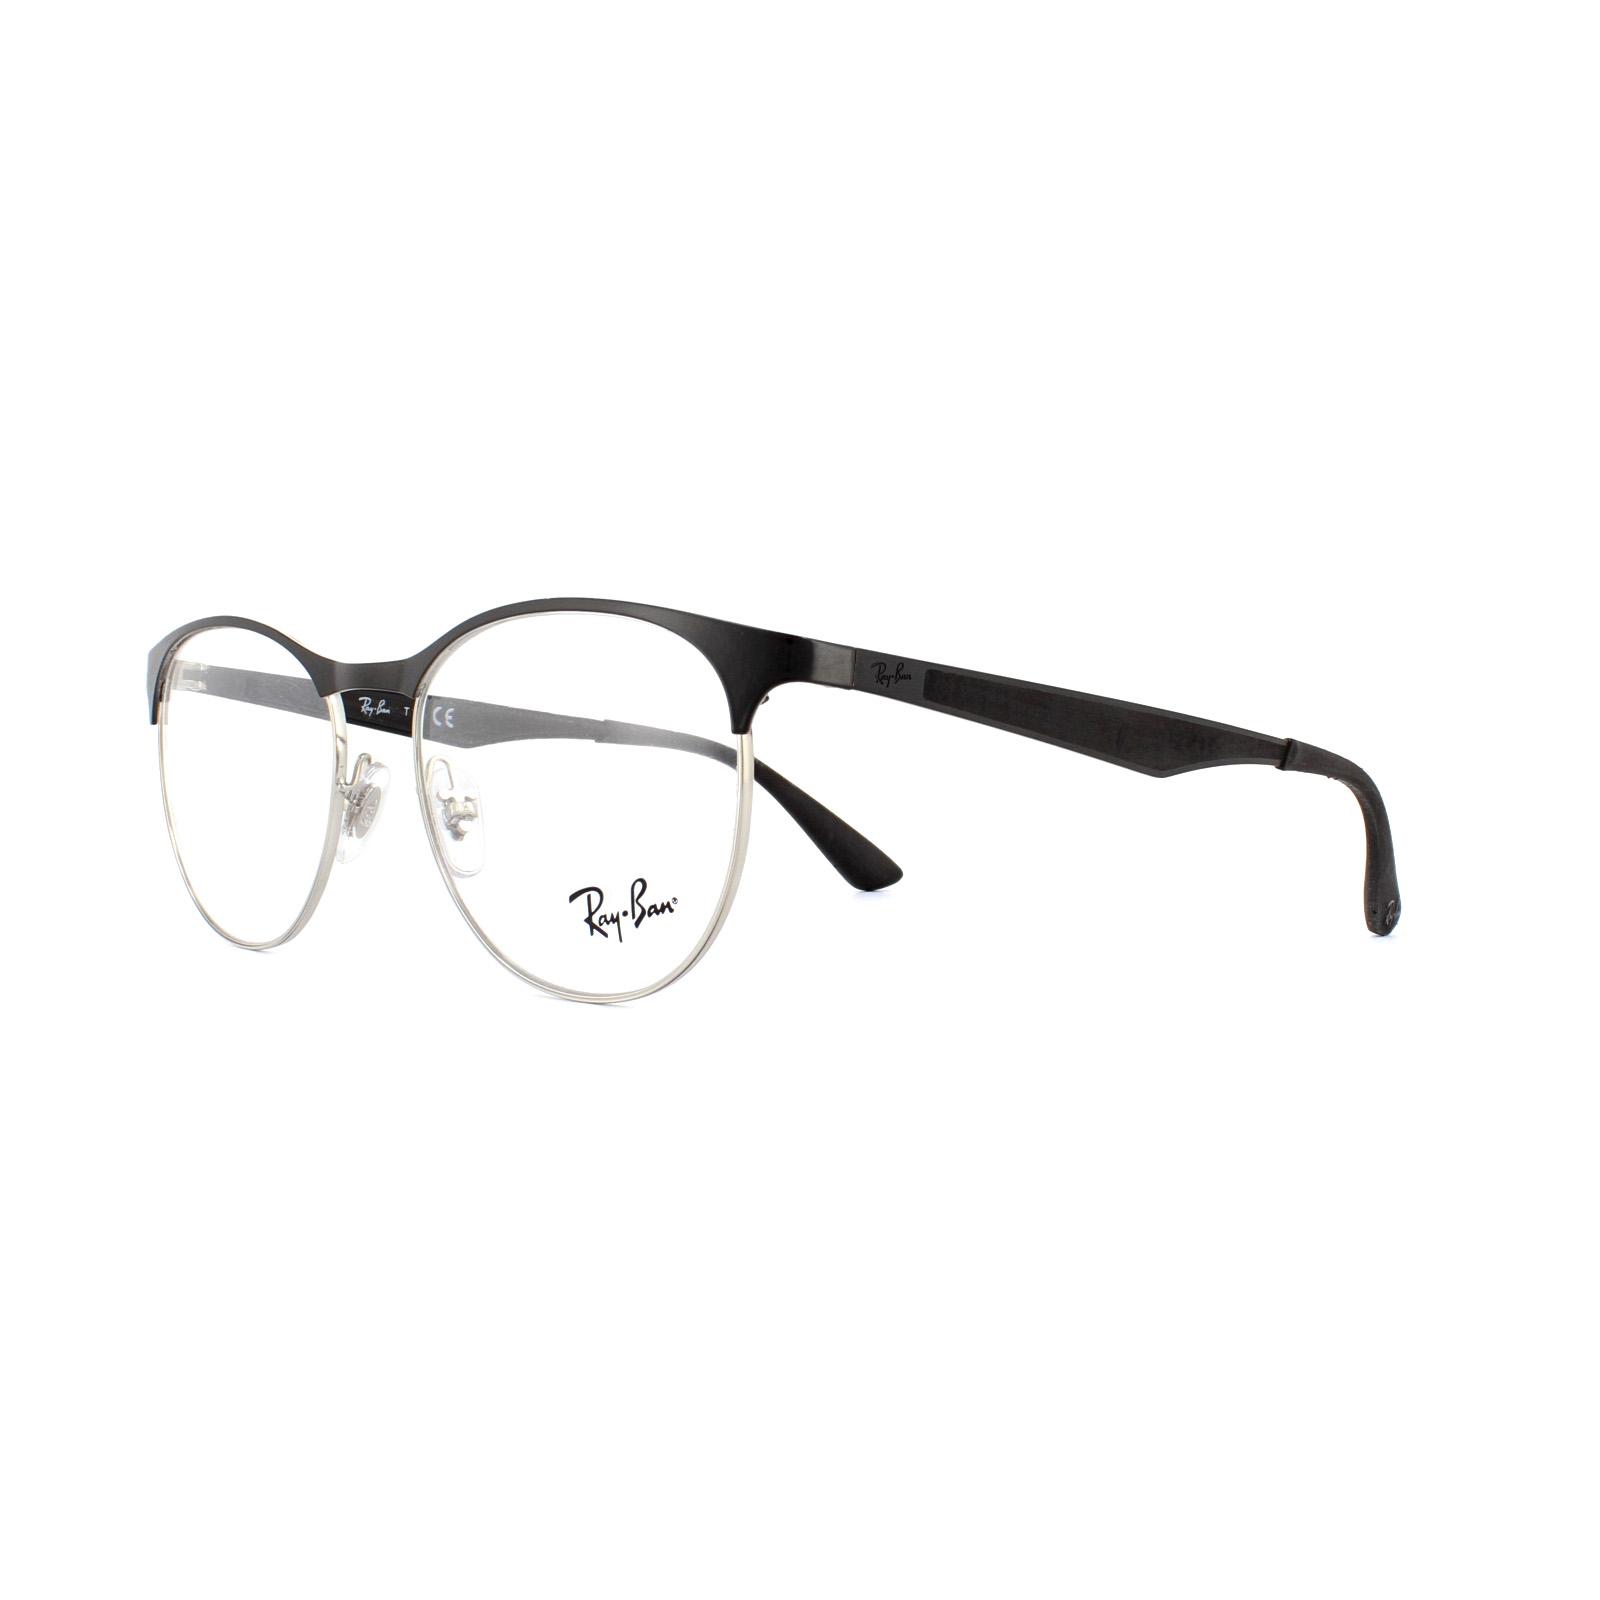 8d3e4b8aeb4 Cheap Ray-Ban 6365 Glasses Frames - Discounted Sunglasses